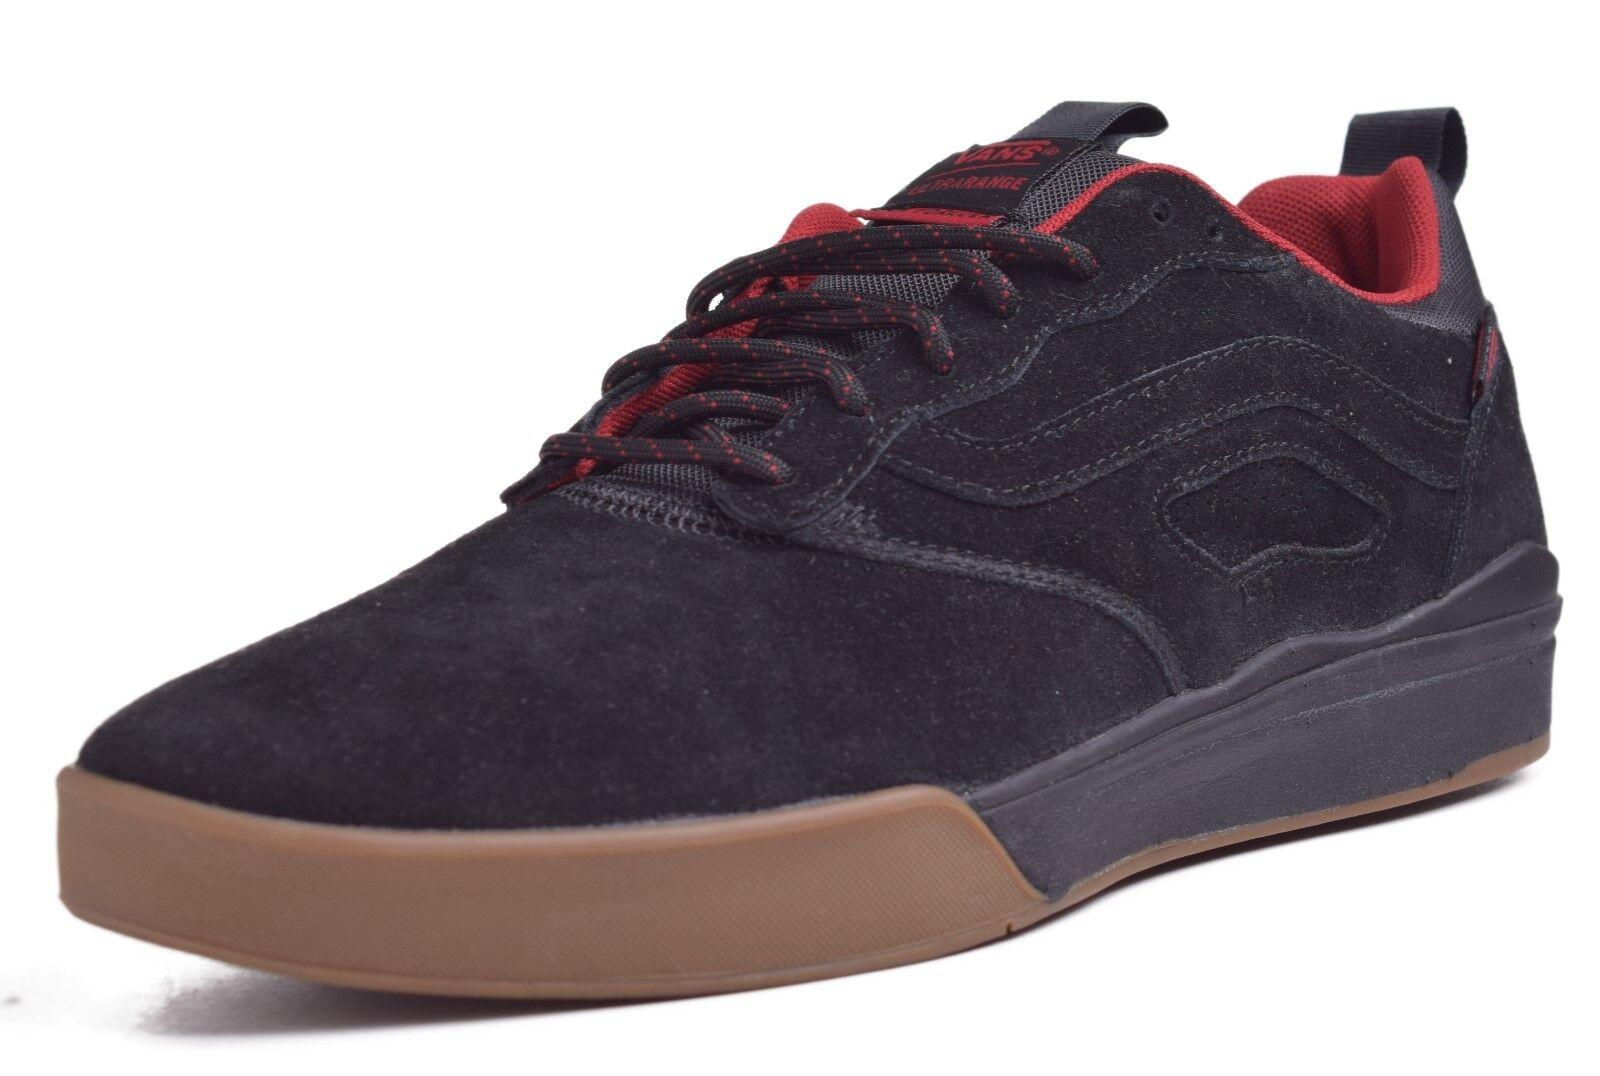 821b7918d1 VANS Skate Shoes UltraRange Pro X Spitfire Size 9.5us Cardiel black ...